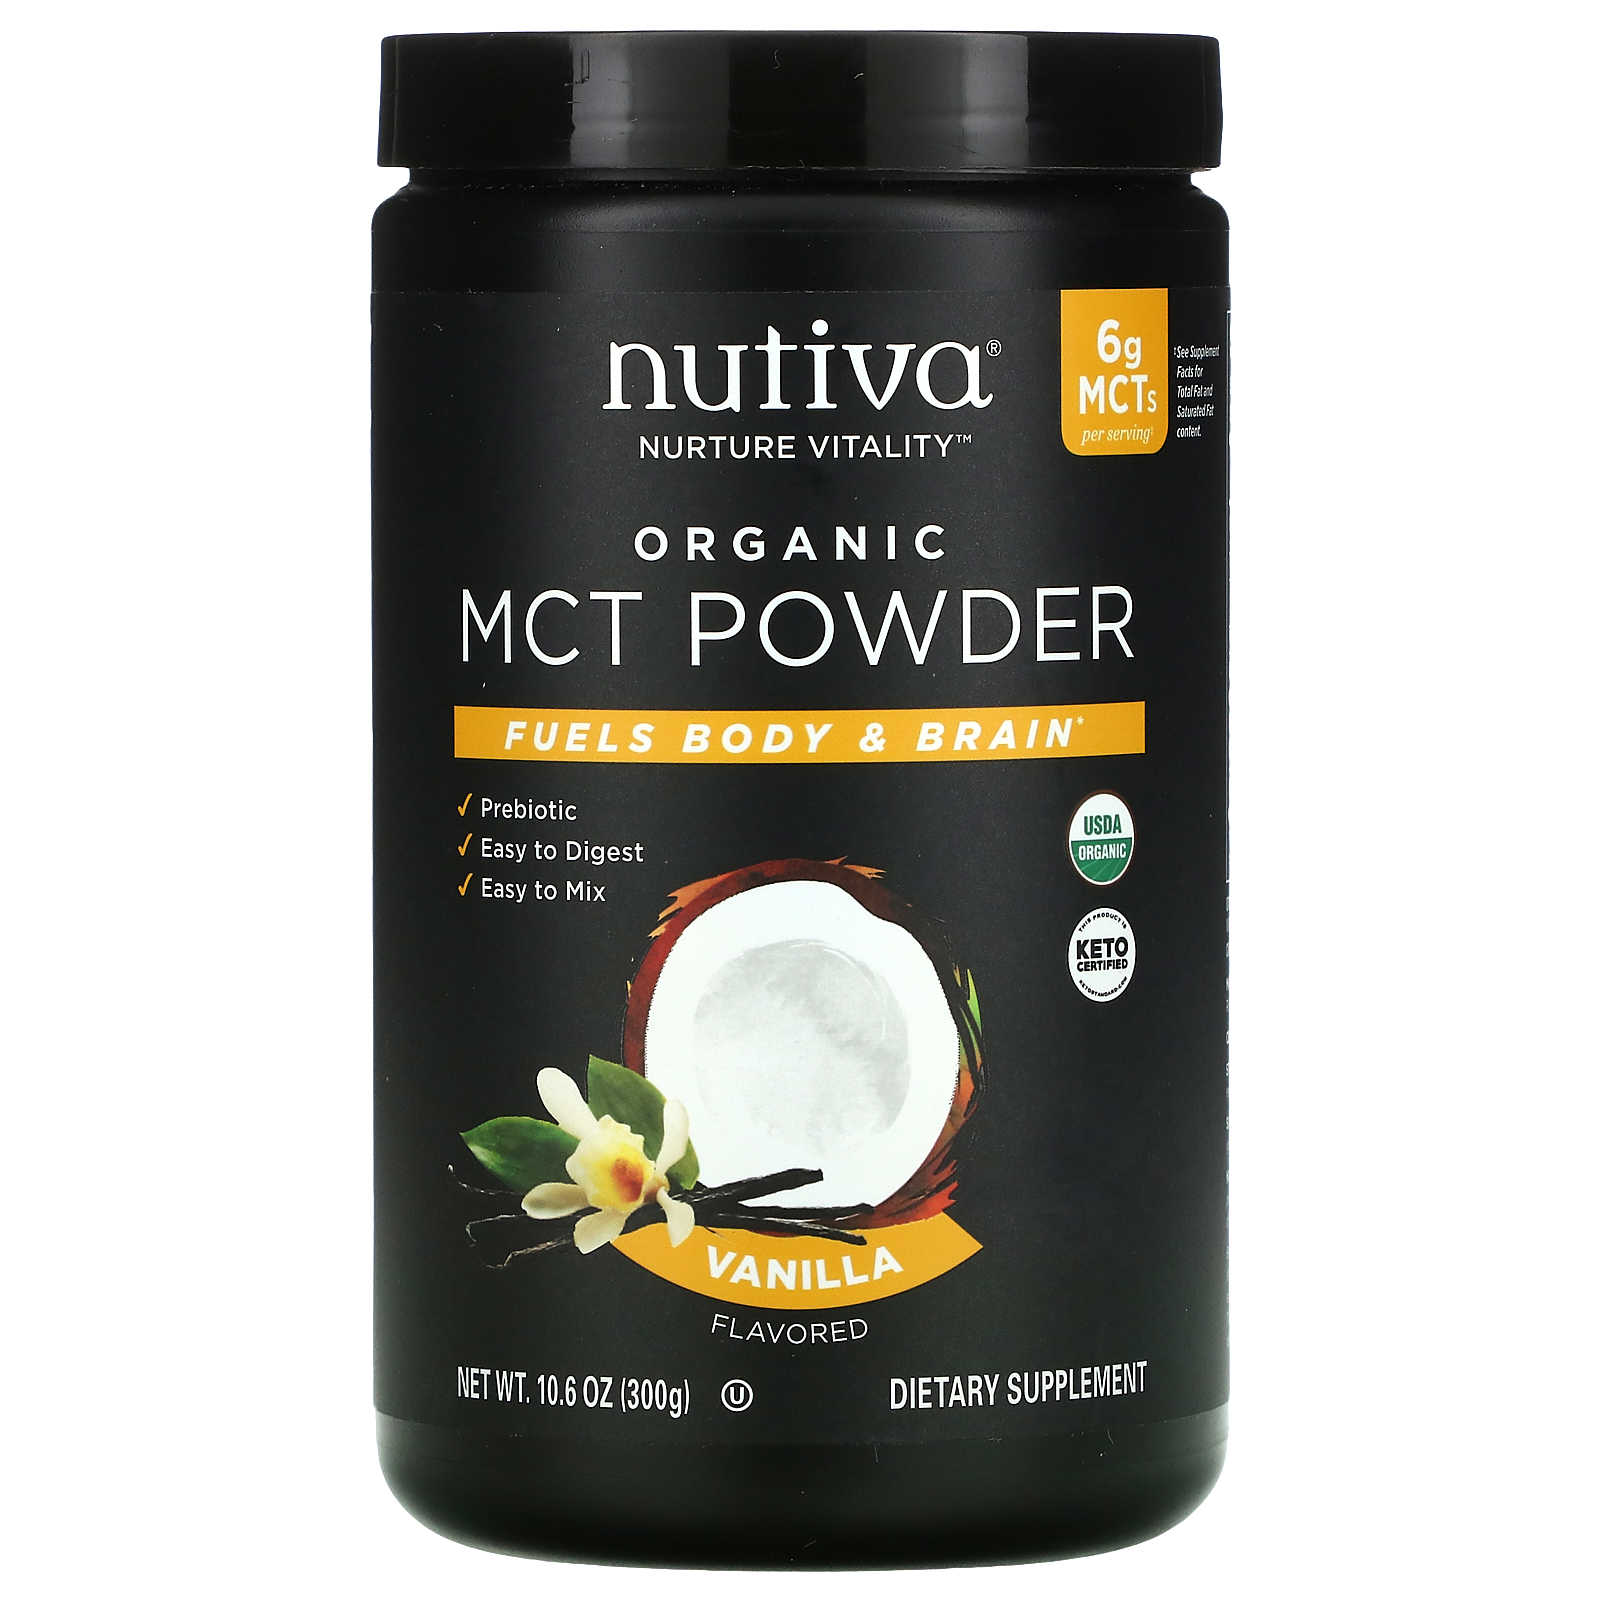 Nutiva, Organic MCT Powder, Vanilla, 8.8 oz 8 g   iHerb